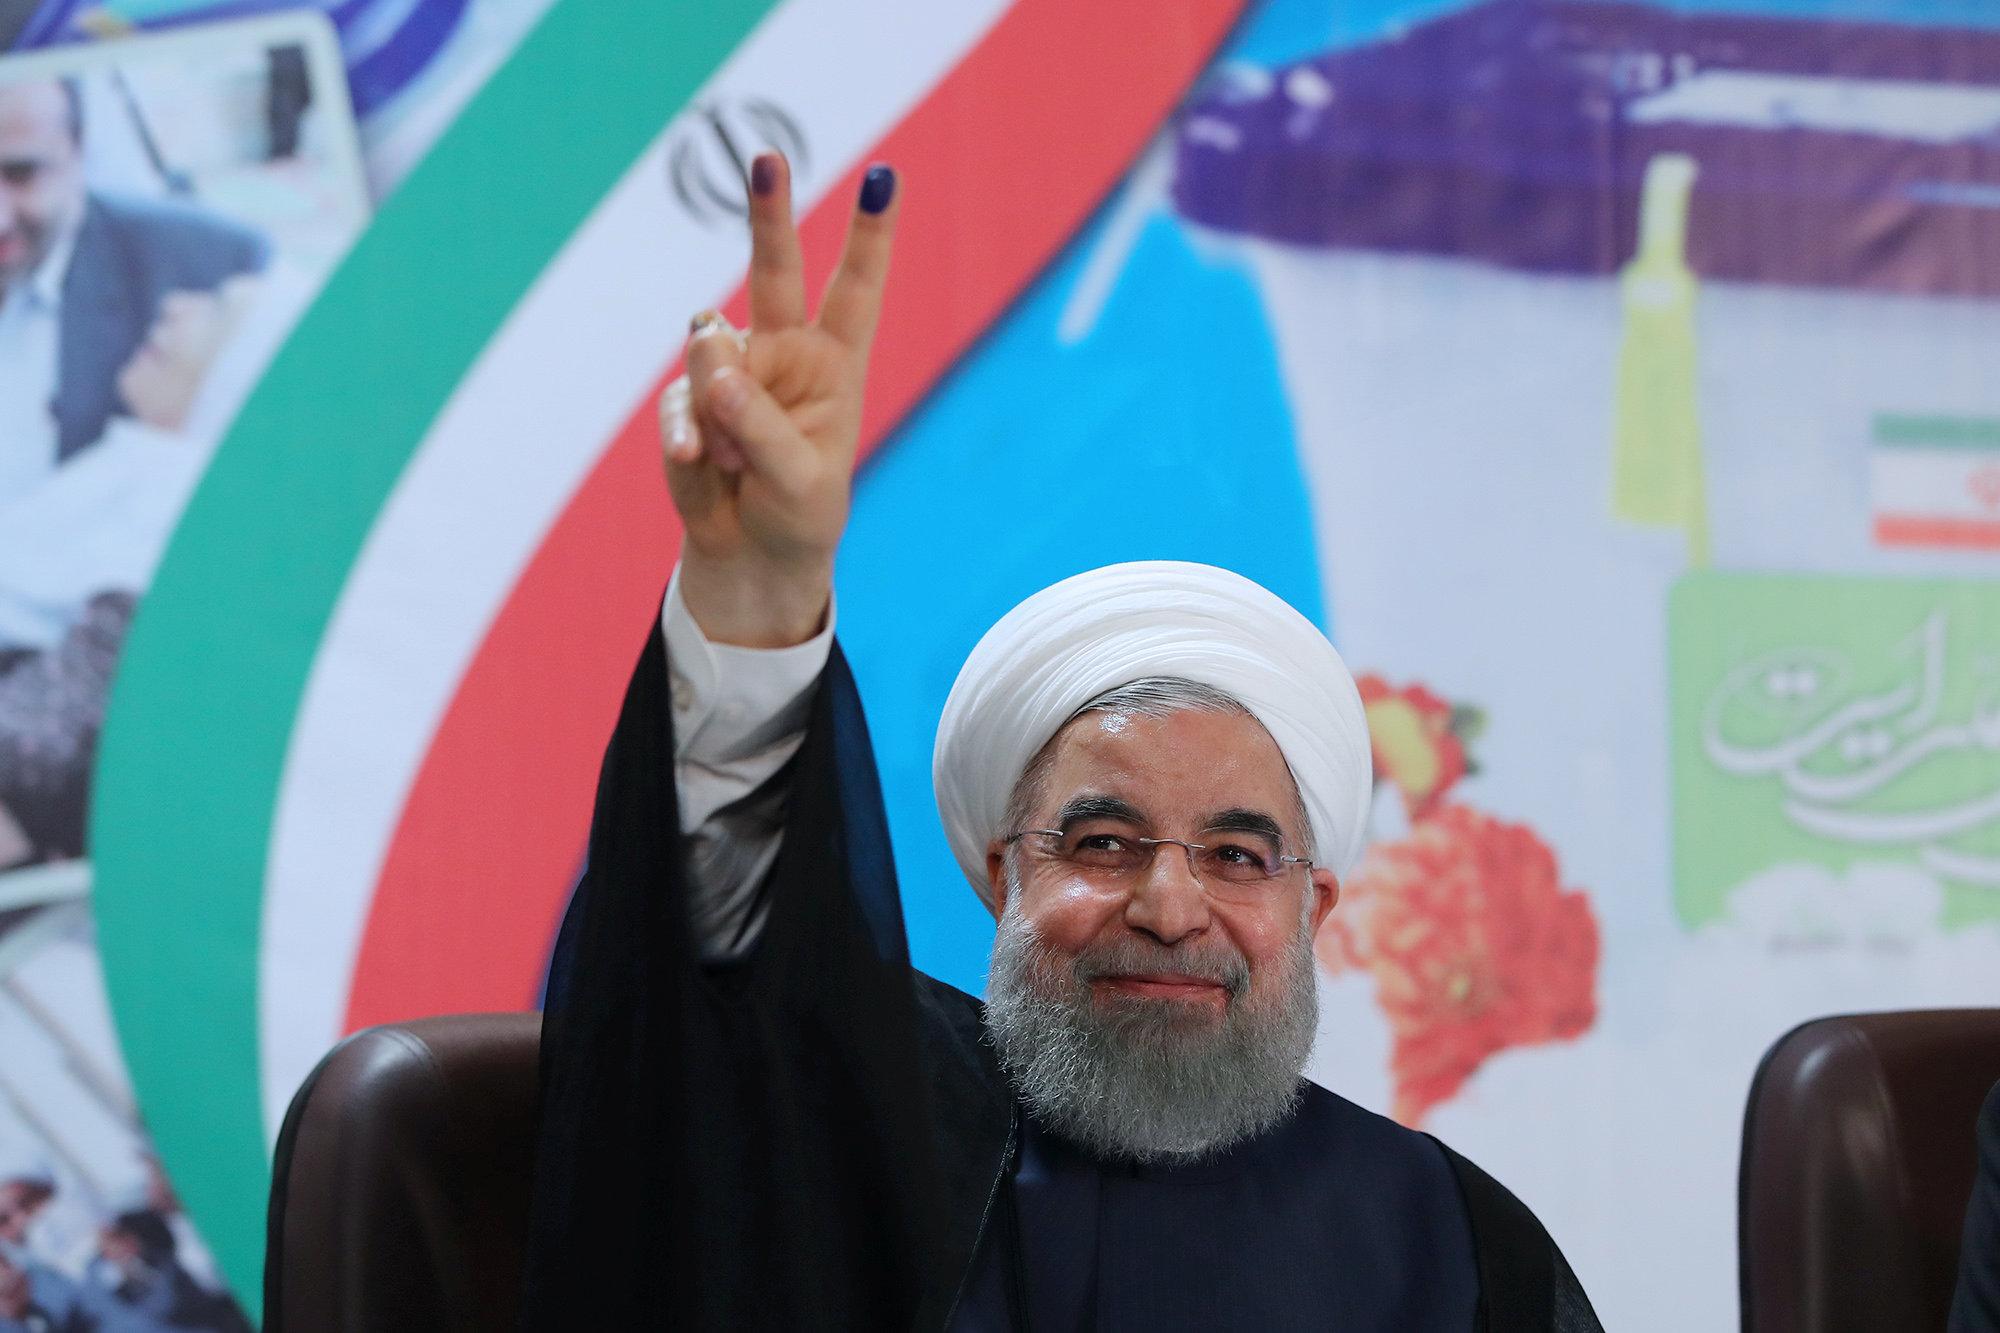 2017 05 12T113430Z 121292694 RC1DB07FCD30 RTRMADP 3 IRAN ELECTION DEBATE